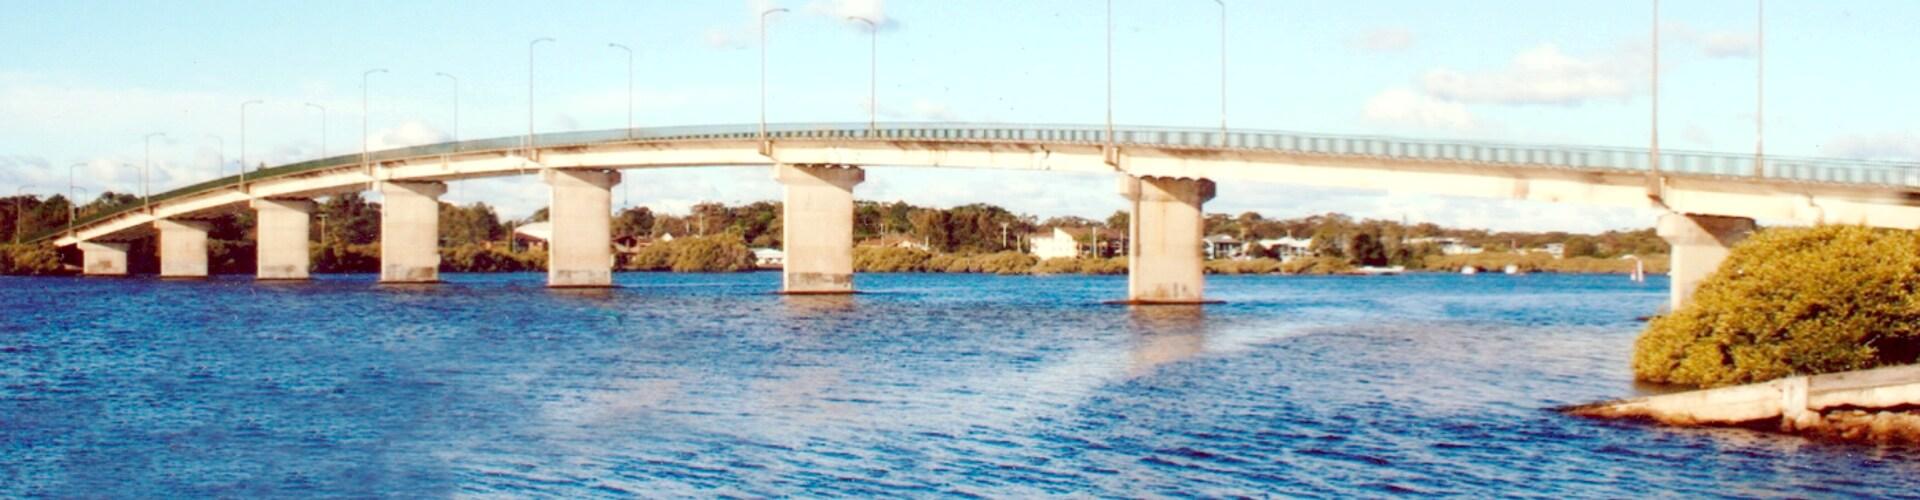 Bridge cropped   png   resized